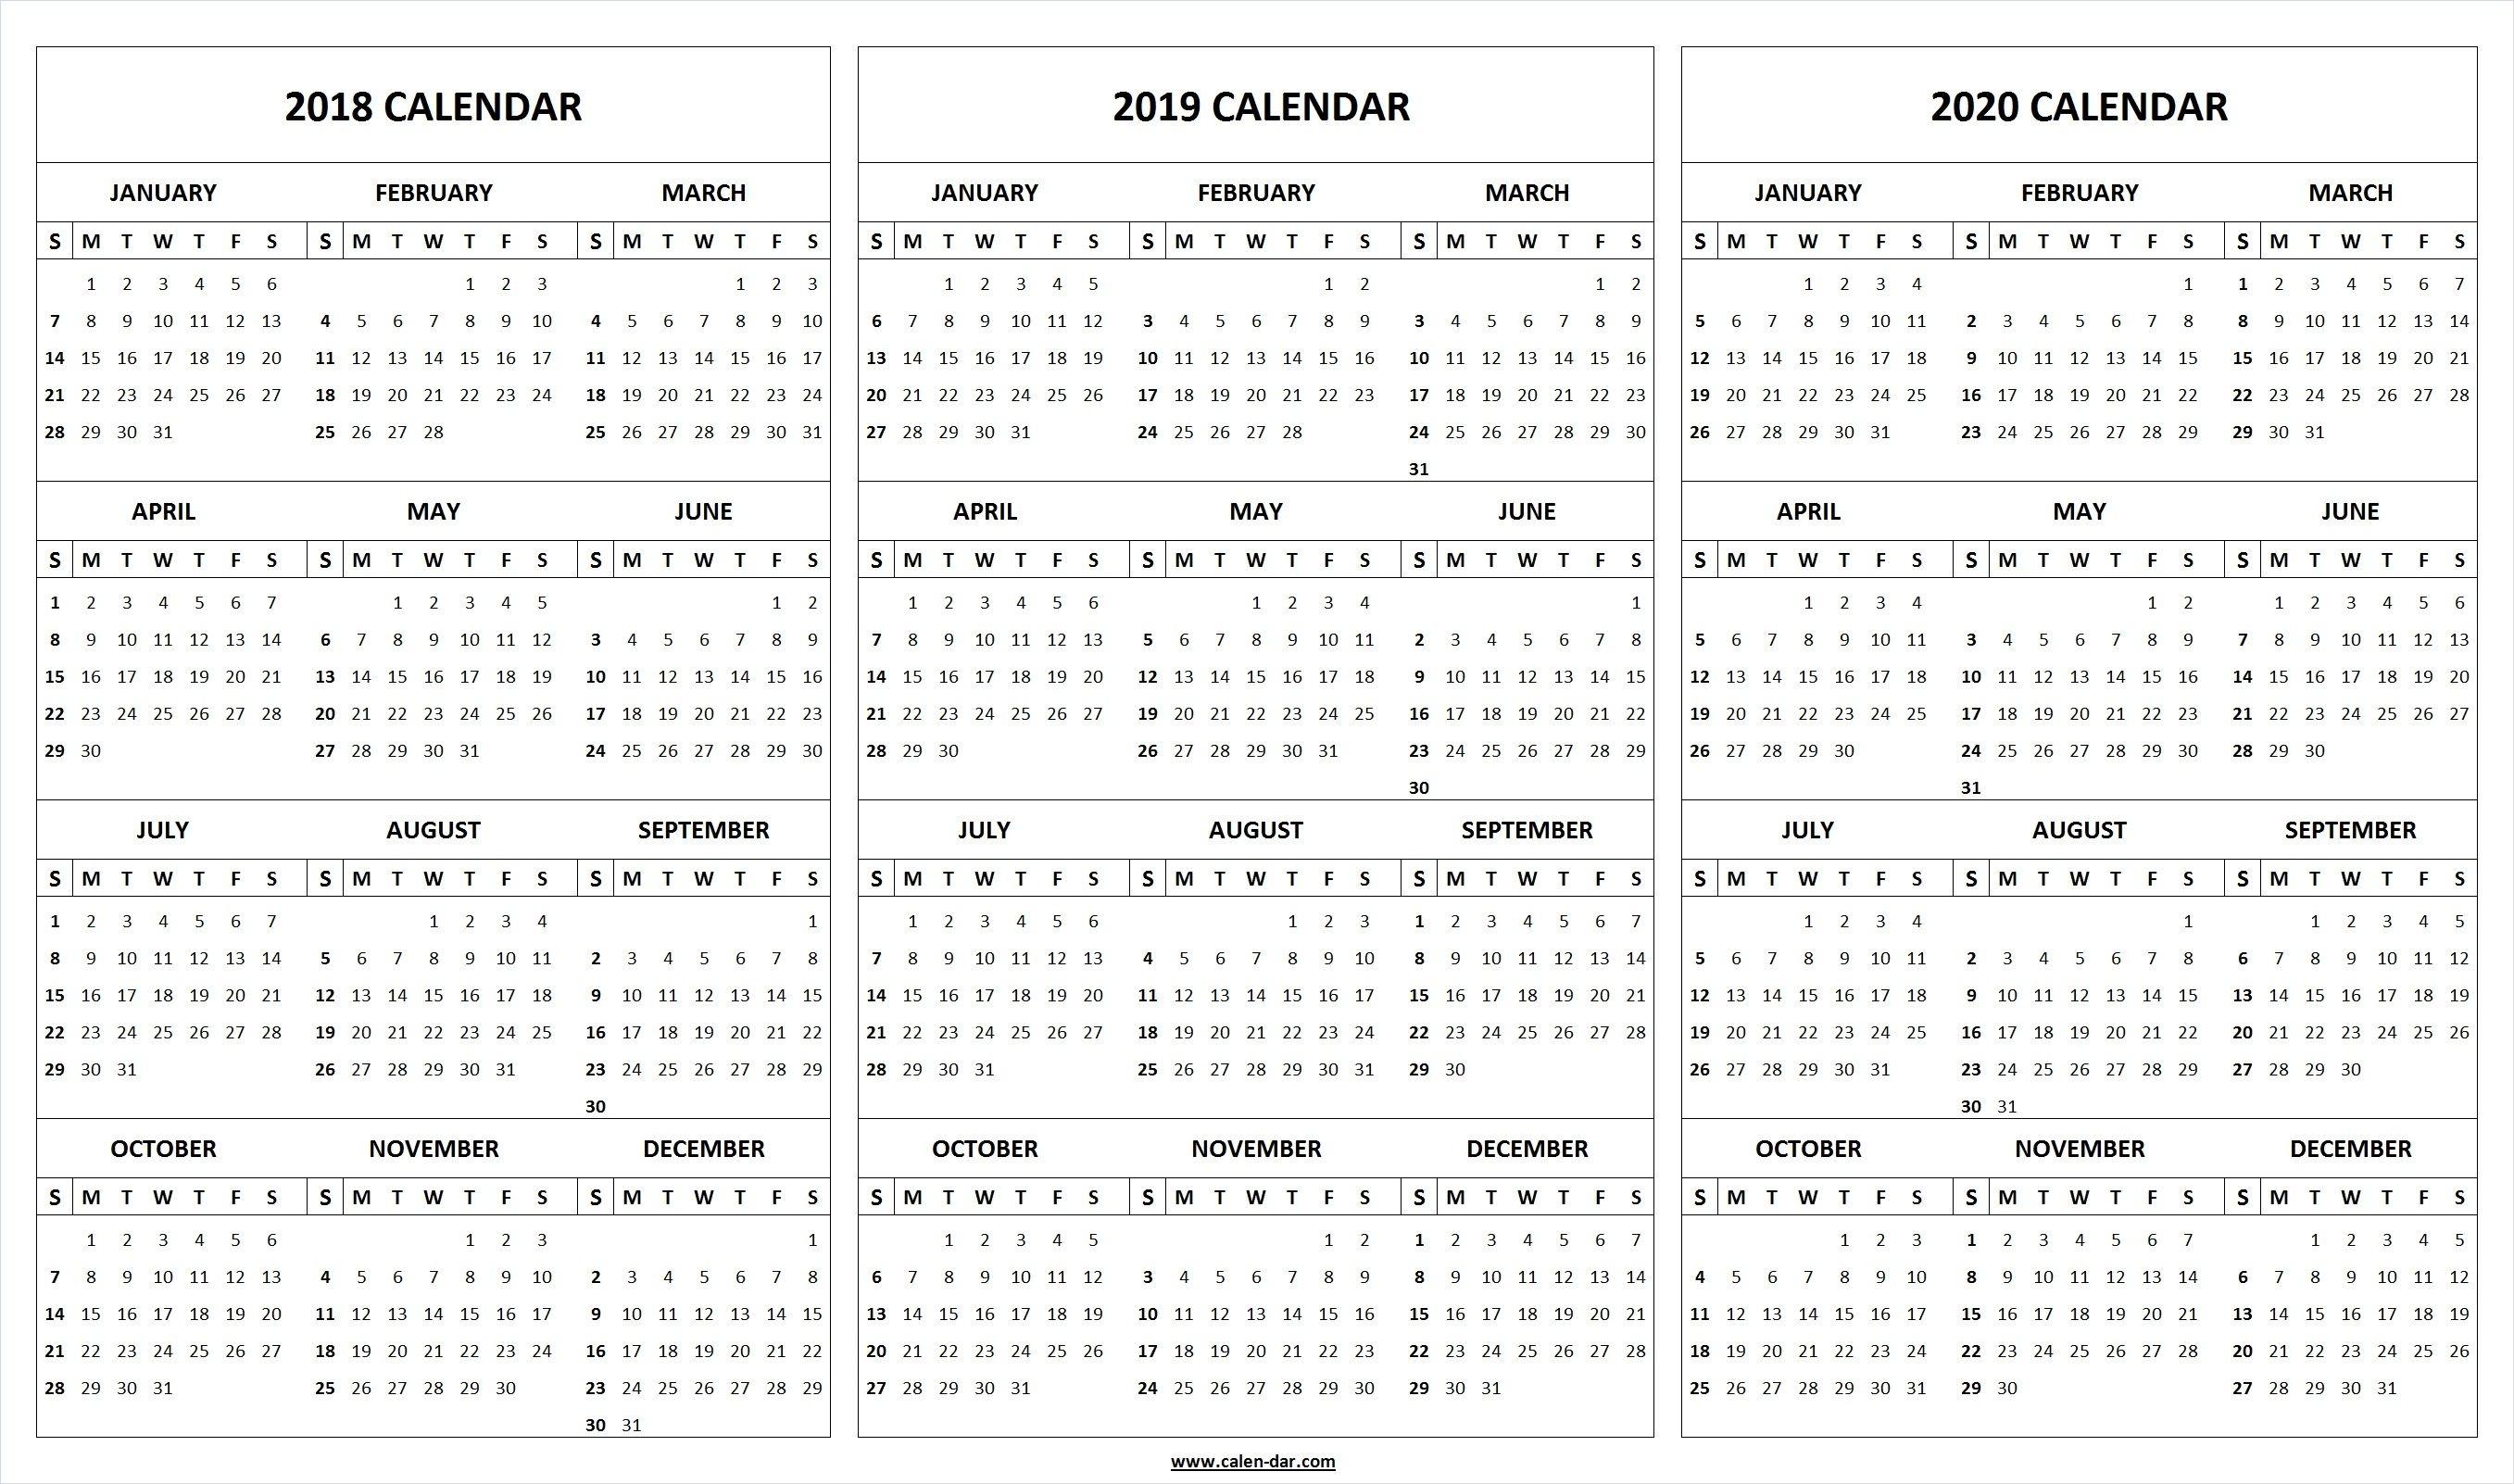 Print Blank 2018 2019 2020 Calendar Template | Organize! | Printable within Uc Berkeley Academic Calendar 2019-2020